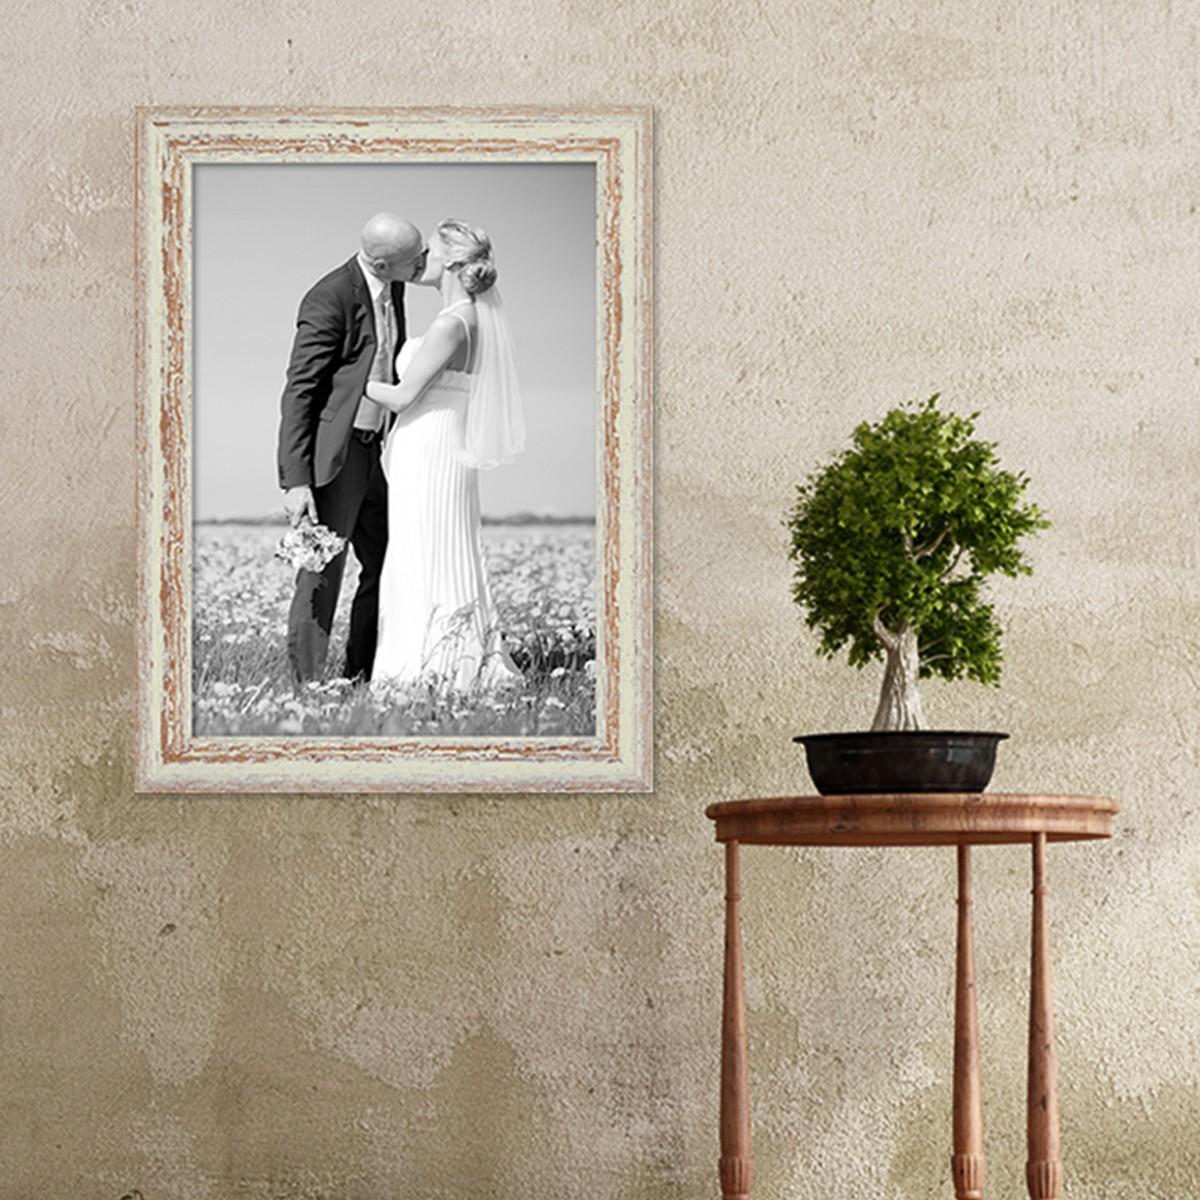 bilderrahmen 30x42 cm din a3 weiss shabby chic vintage. Black Bedroom Furniture Sets. Home Design Ideas